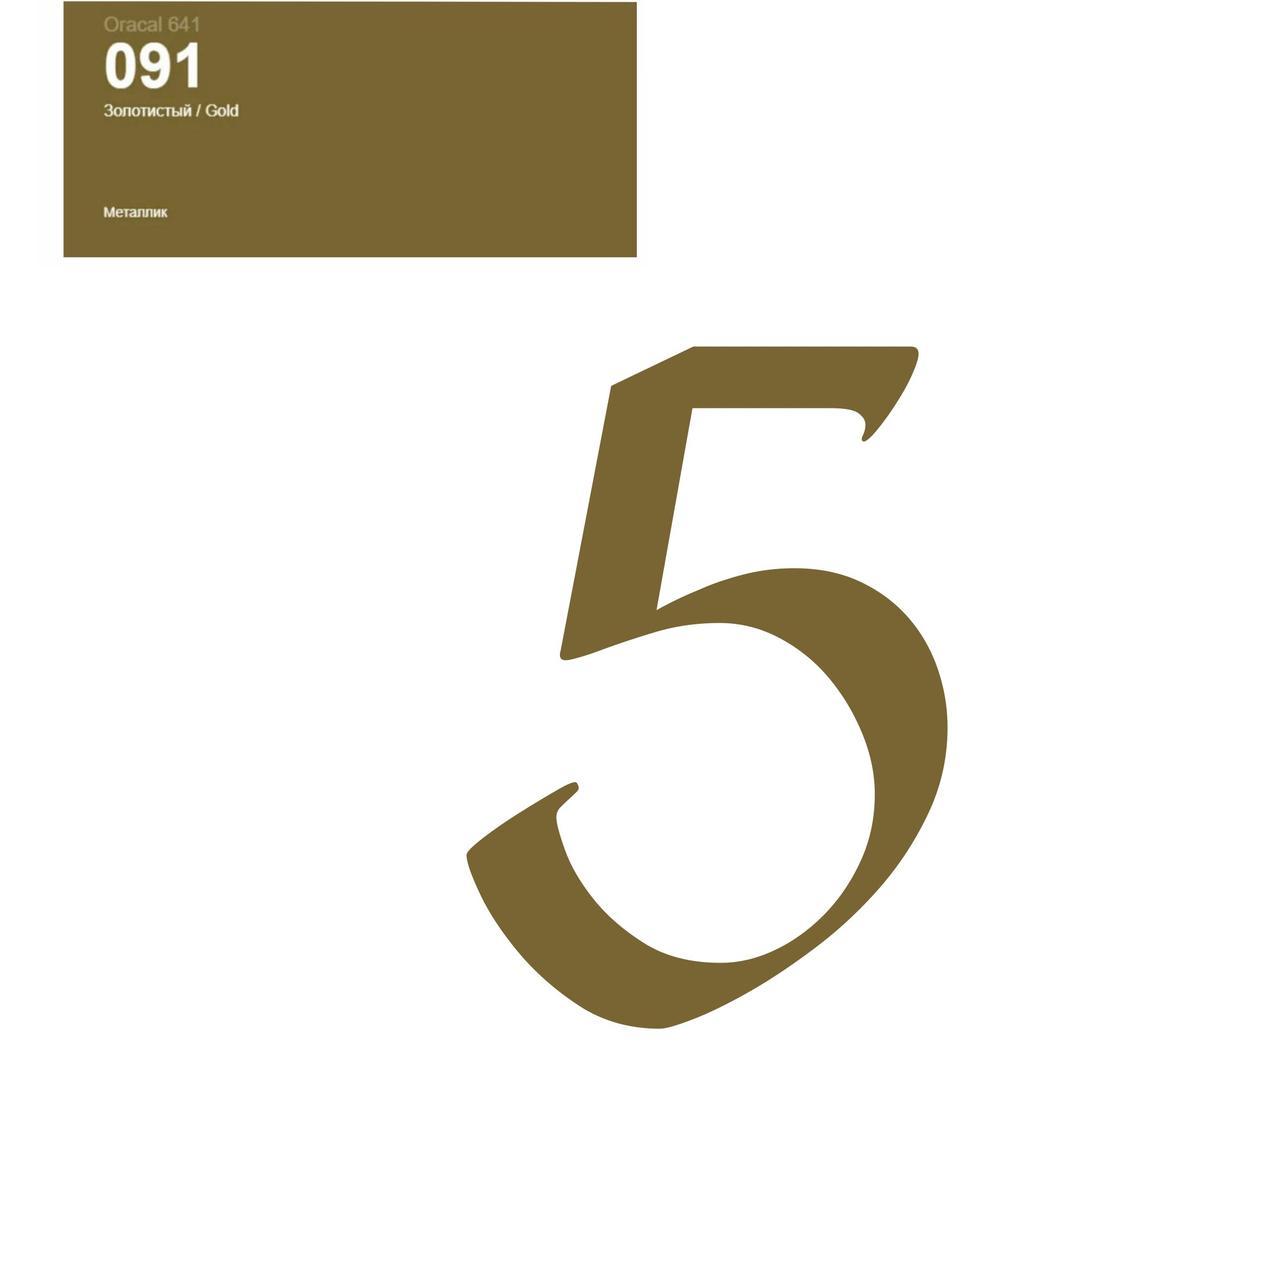 "Оракал Цифра 5 золотий 091, кулька фольга 18"" або 12"" латексна"